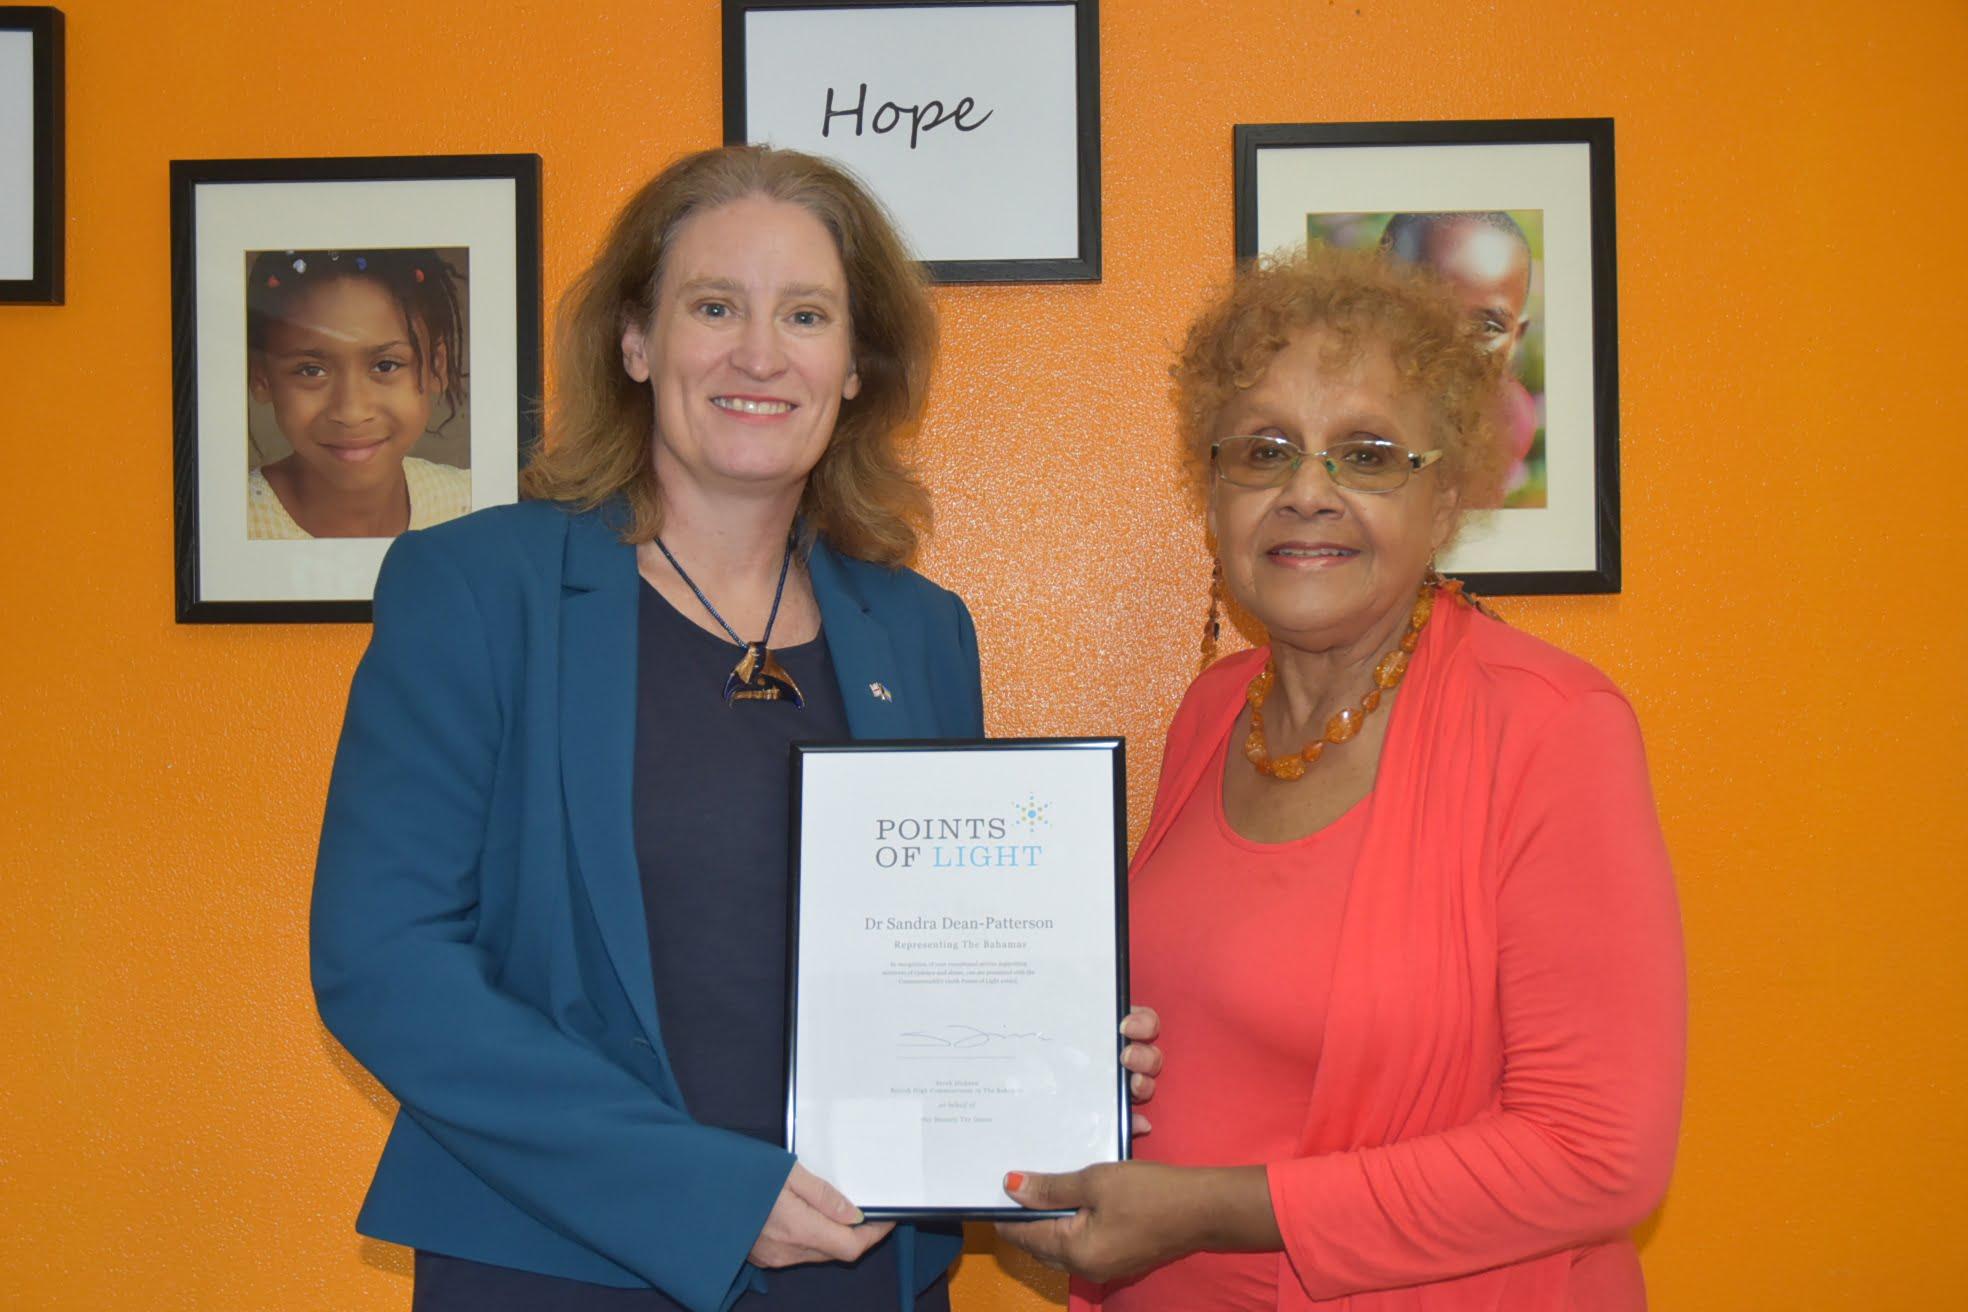 Queen Elizabeth II recognizes Bahamian volunteer with Commonwealth Points of Light award